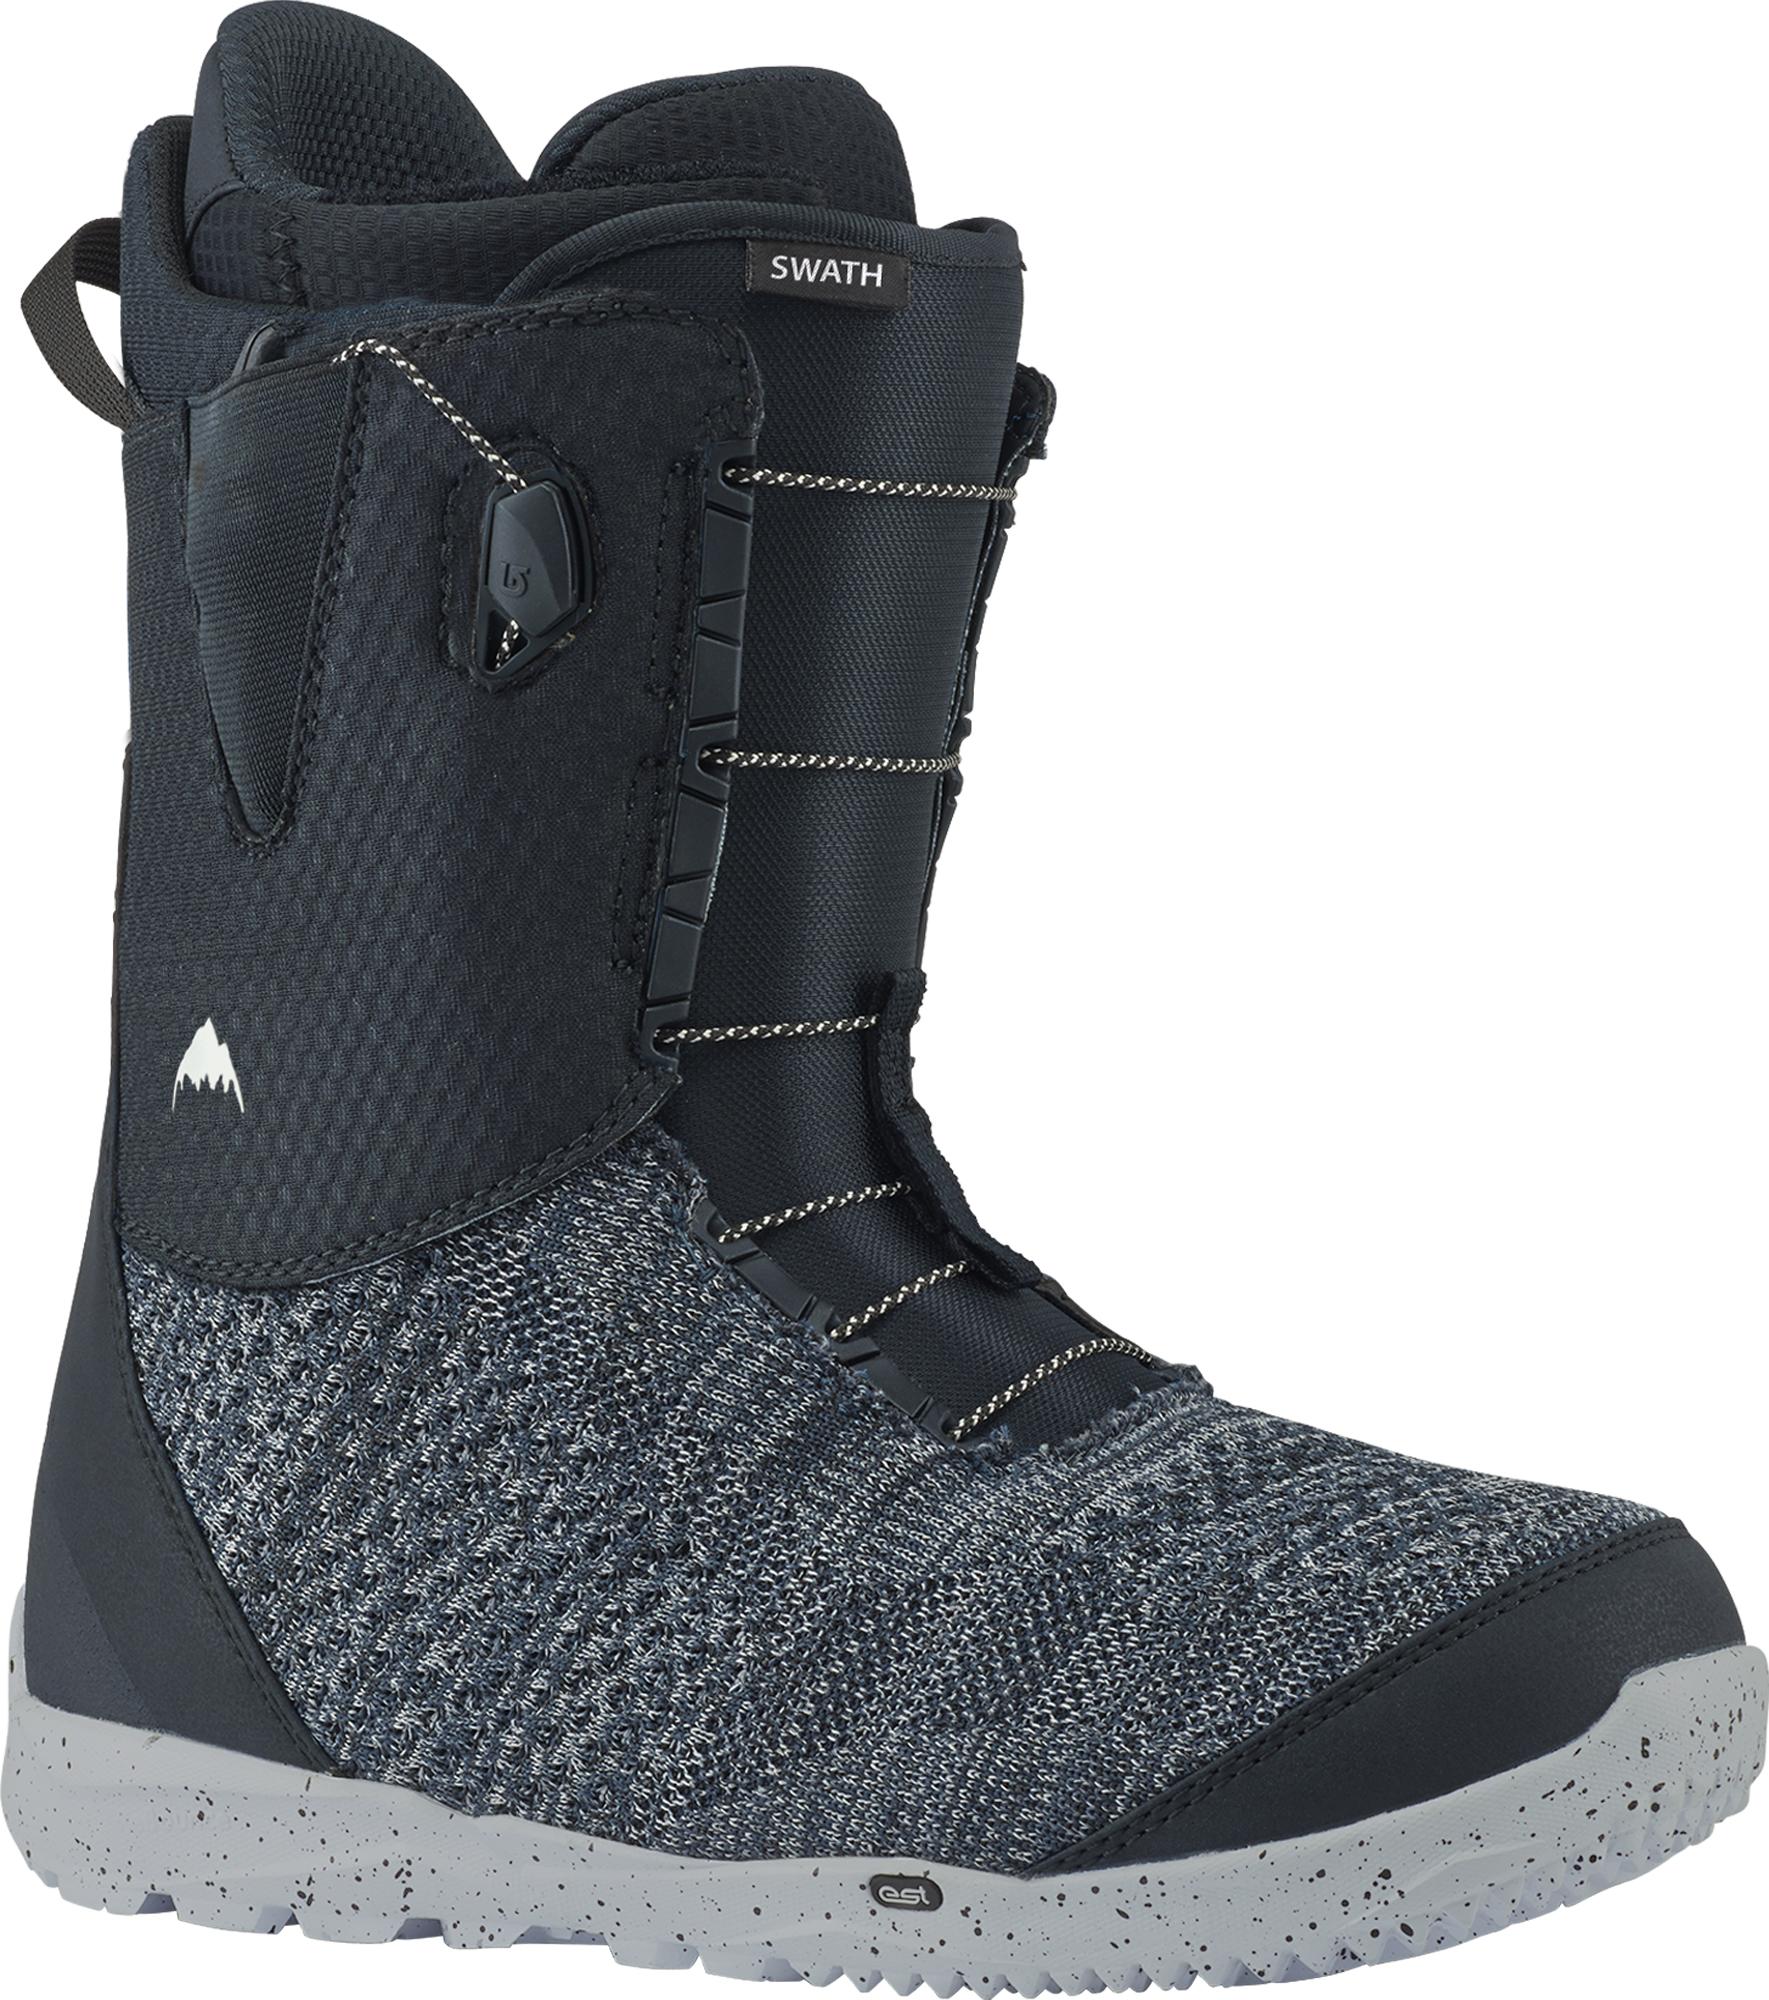 Burton Сноубордические ботинки Swath, размер 40,5